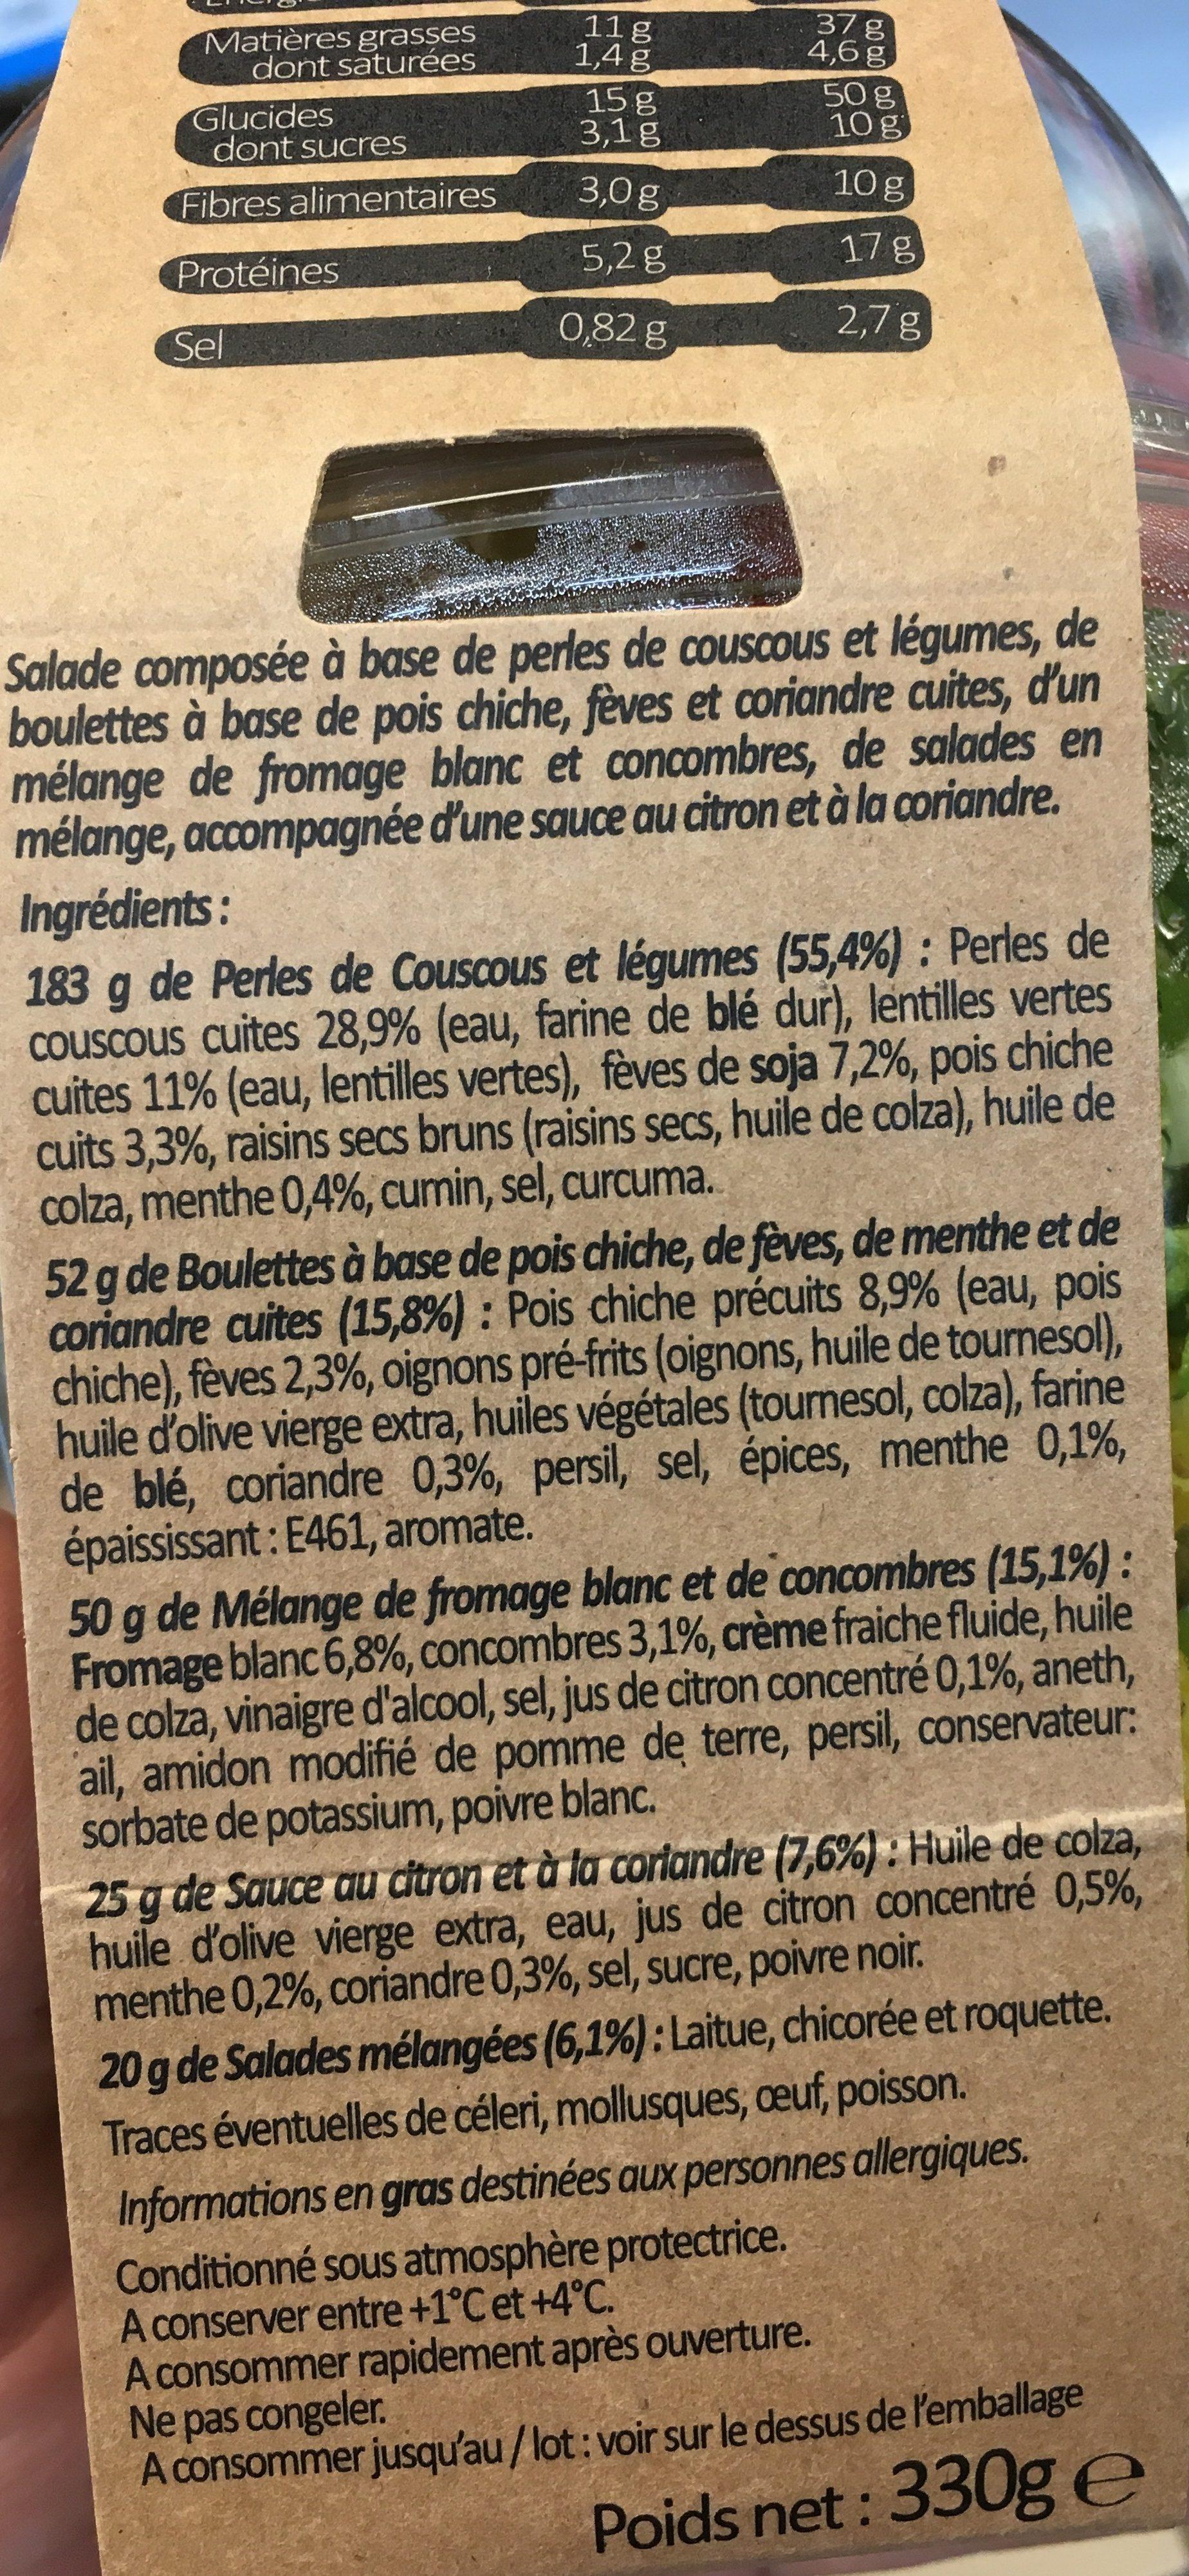 Falafel menthe - Ingredients